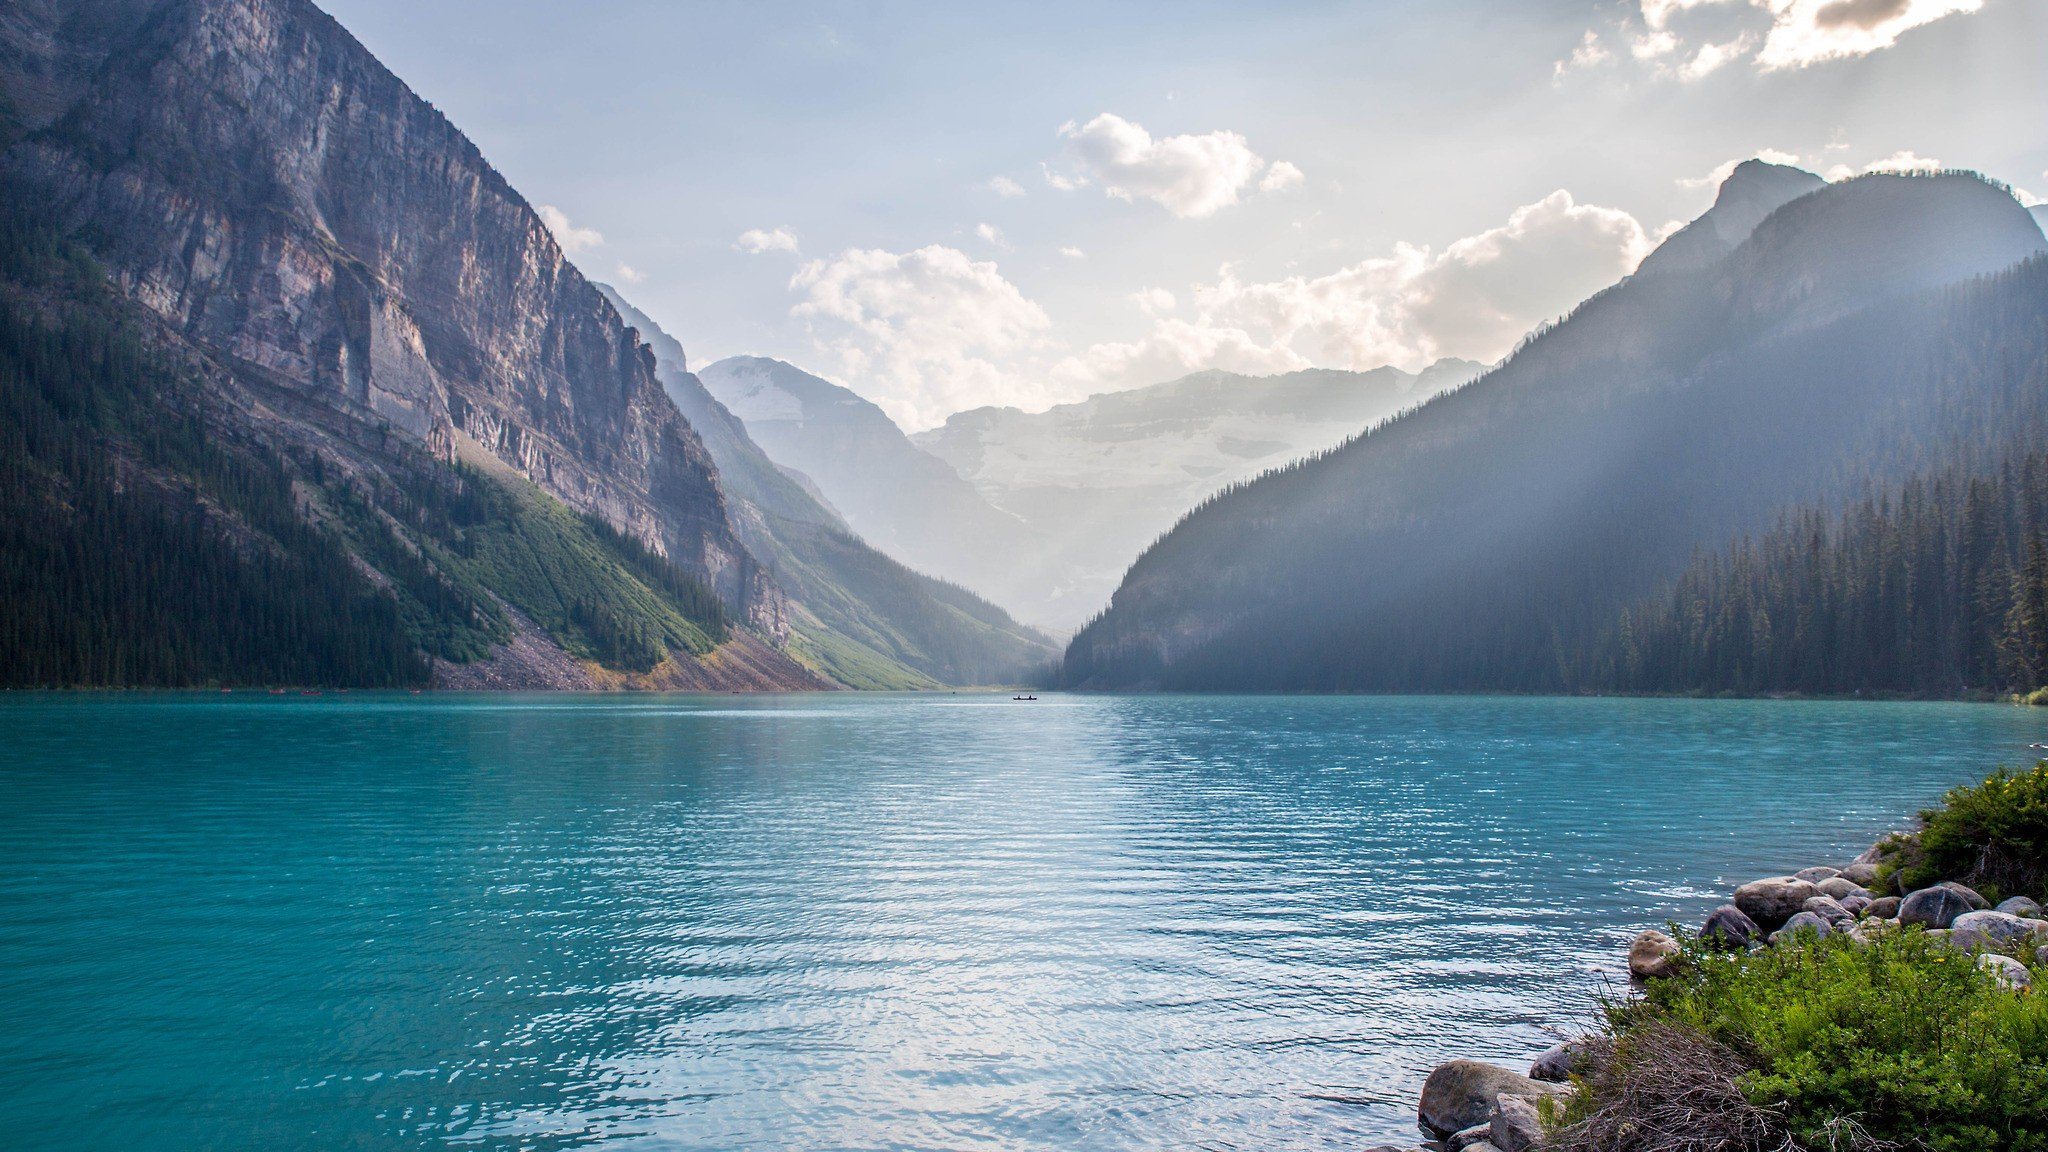 lake, Mountains, Water, Forest, Sky, Canada, Lake Louise ...Lake Water Wallpaper